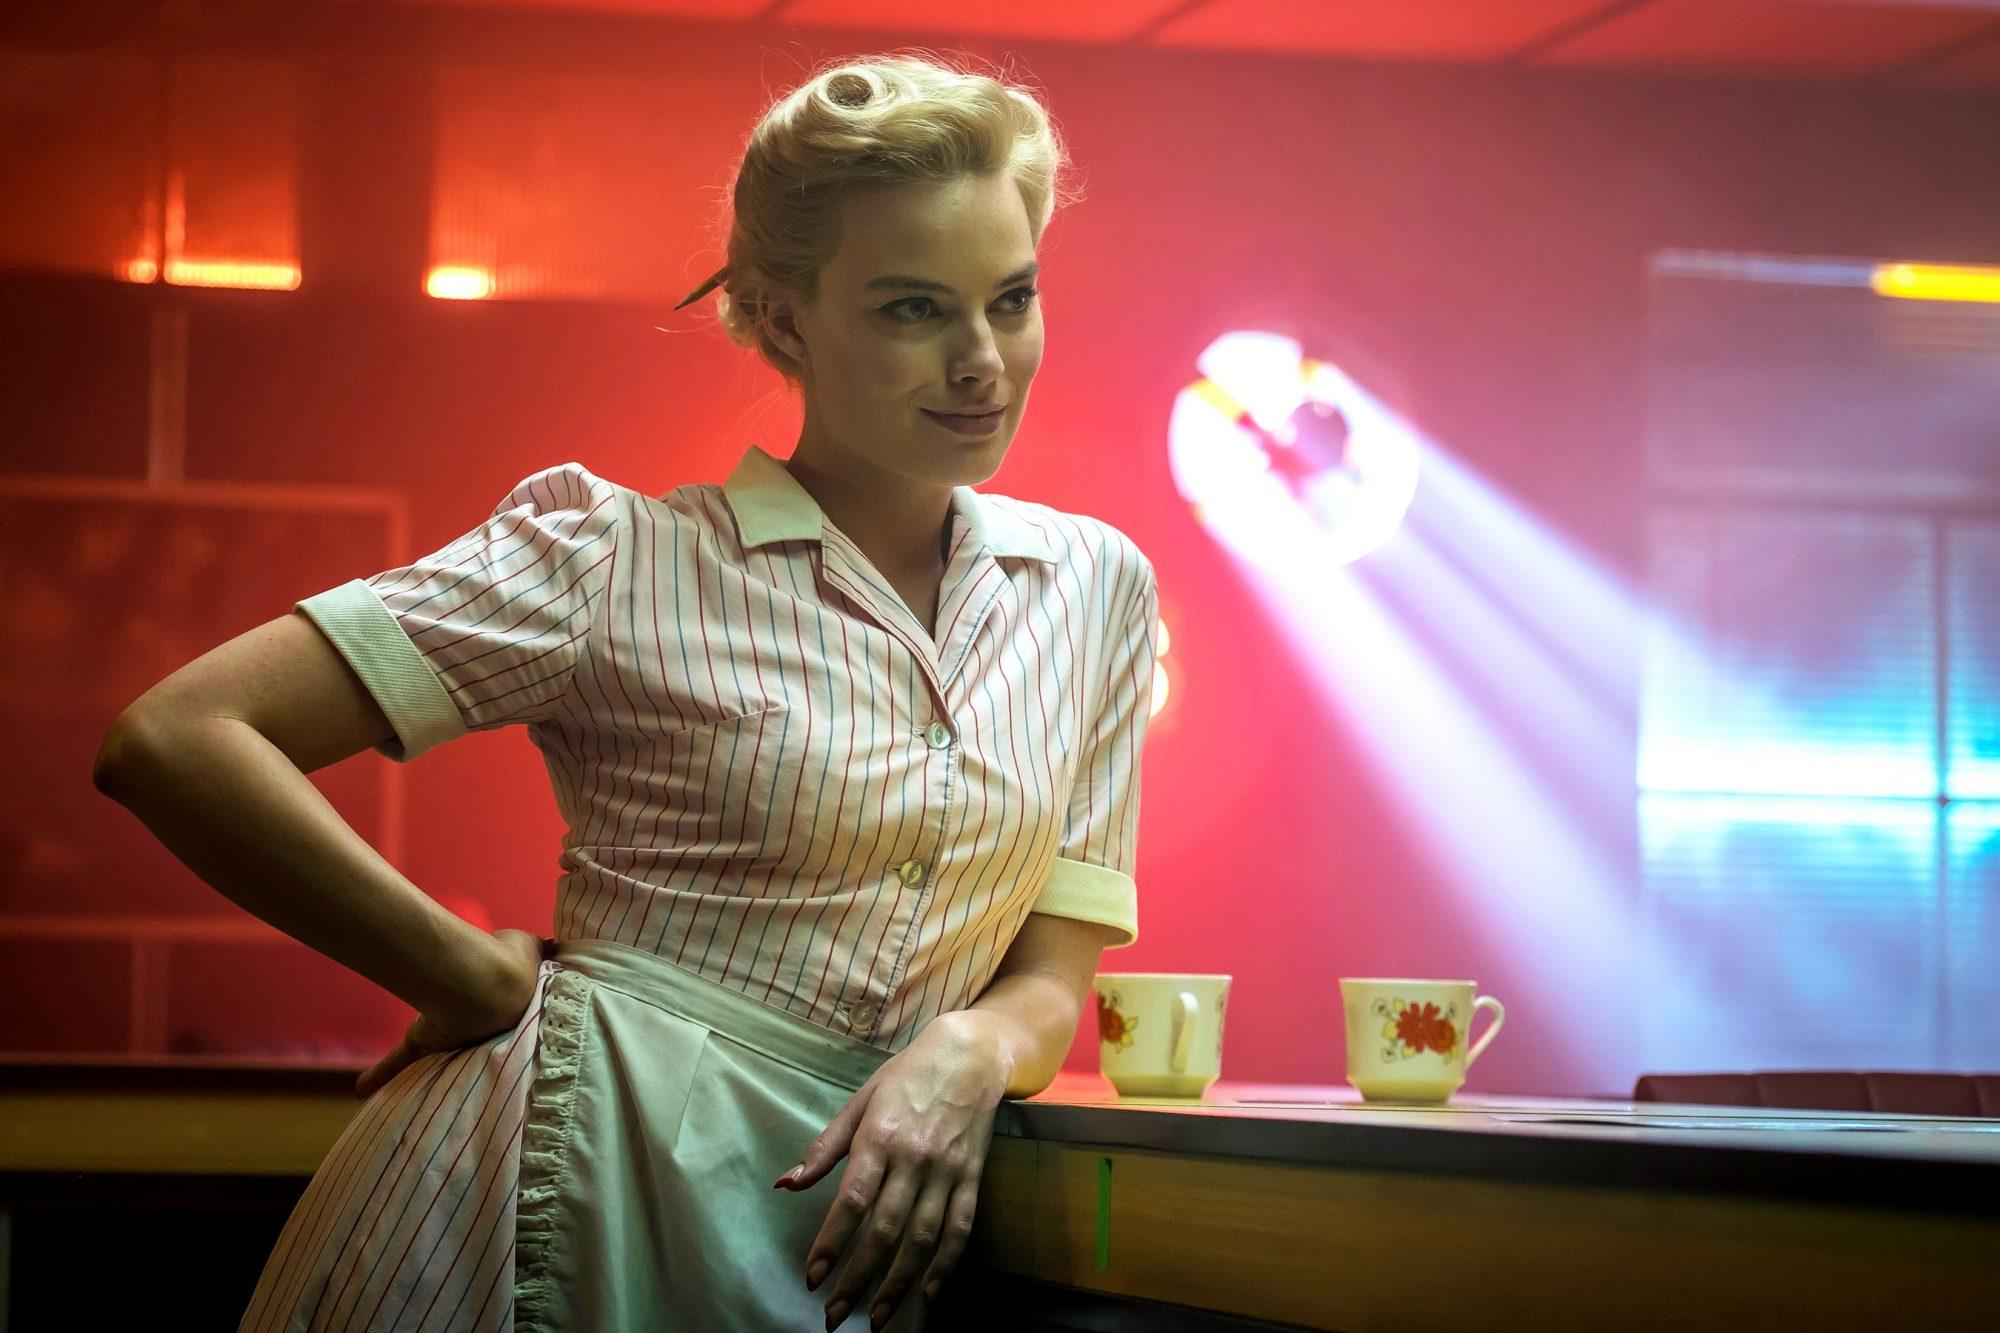 TerminalMargot Robbie as Annie CR: RLJE Films